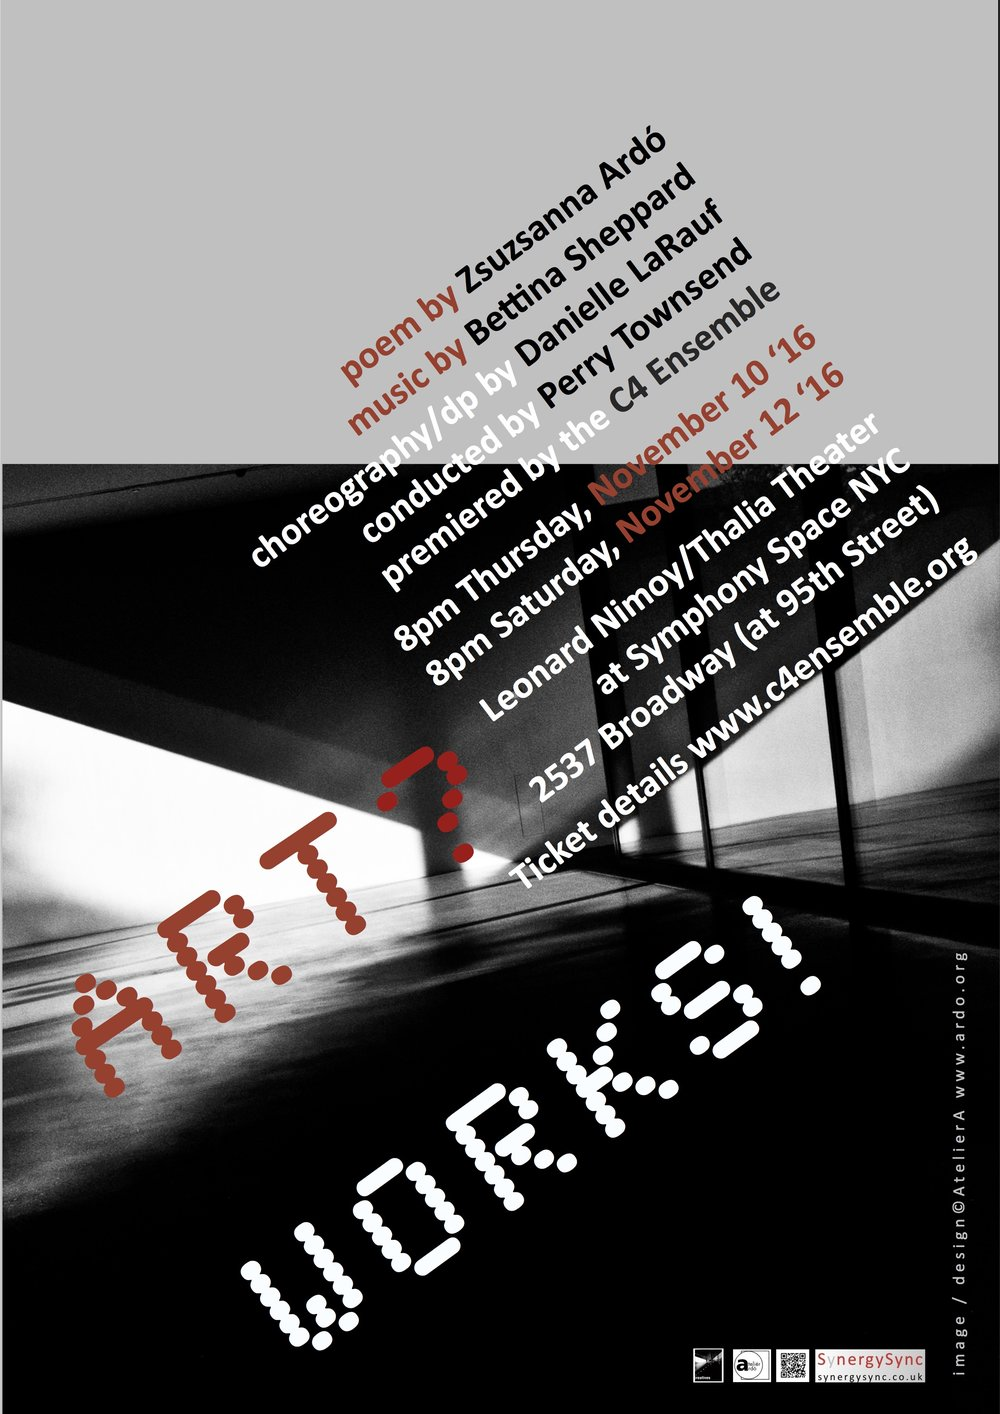 16US NY C4 ArtWorks concert poster 5©AtelierA.jpg